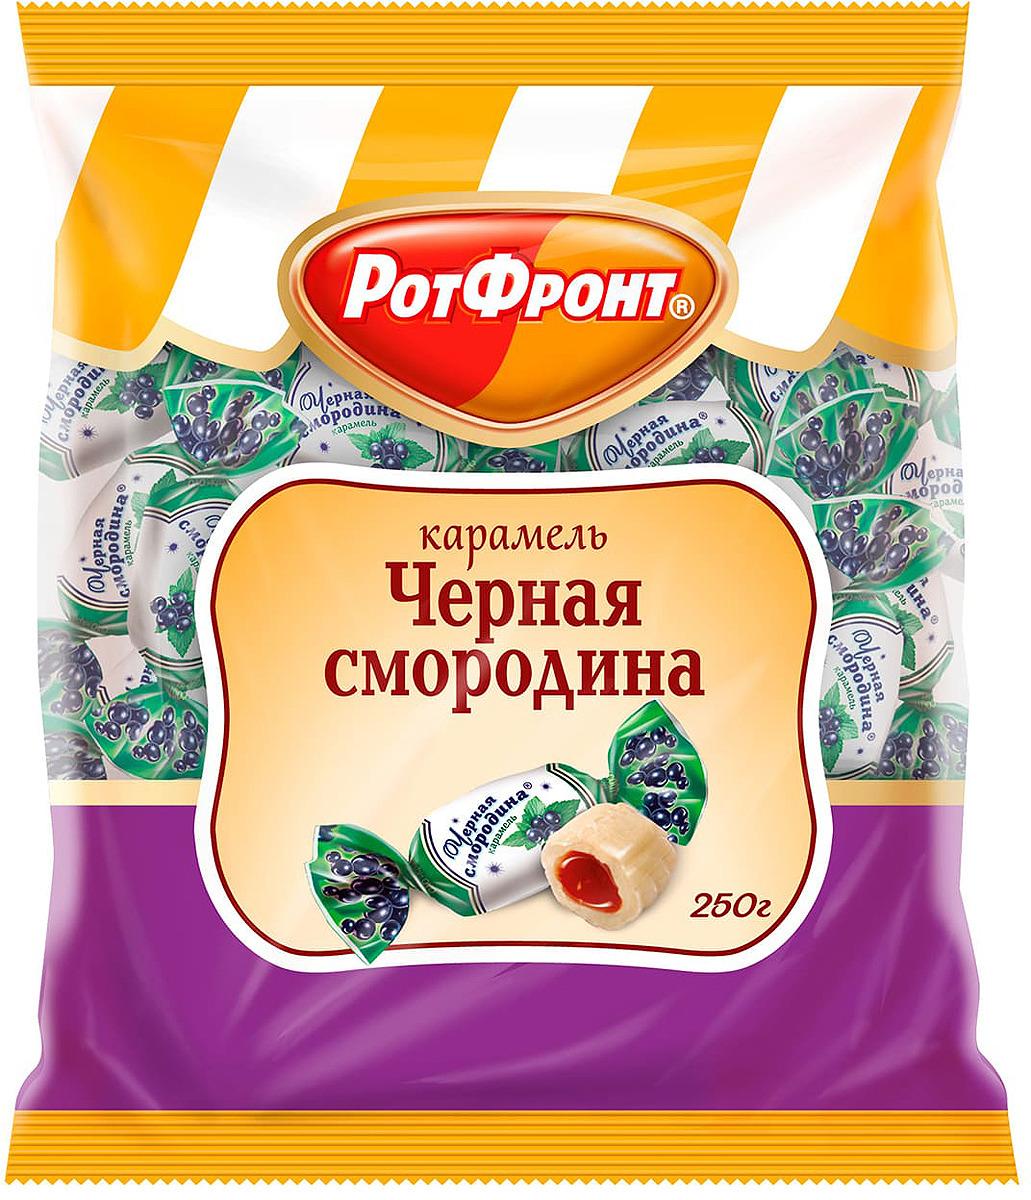 Карамель Красный Октябрь Черная смородина, 250 г пудовъ мастика сахарная белая 500 г